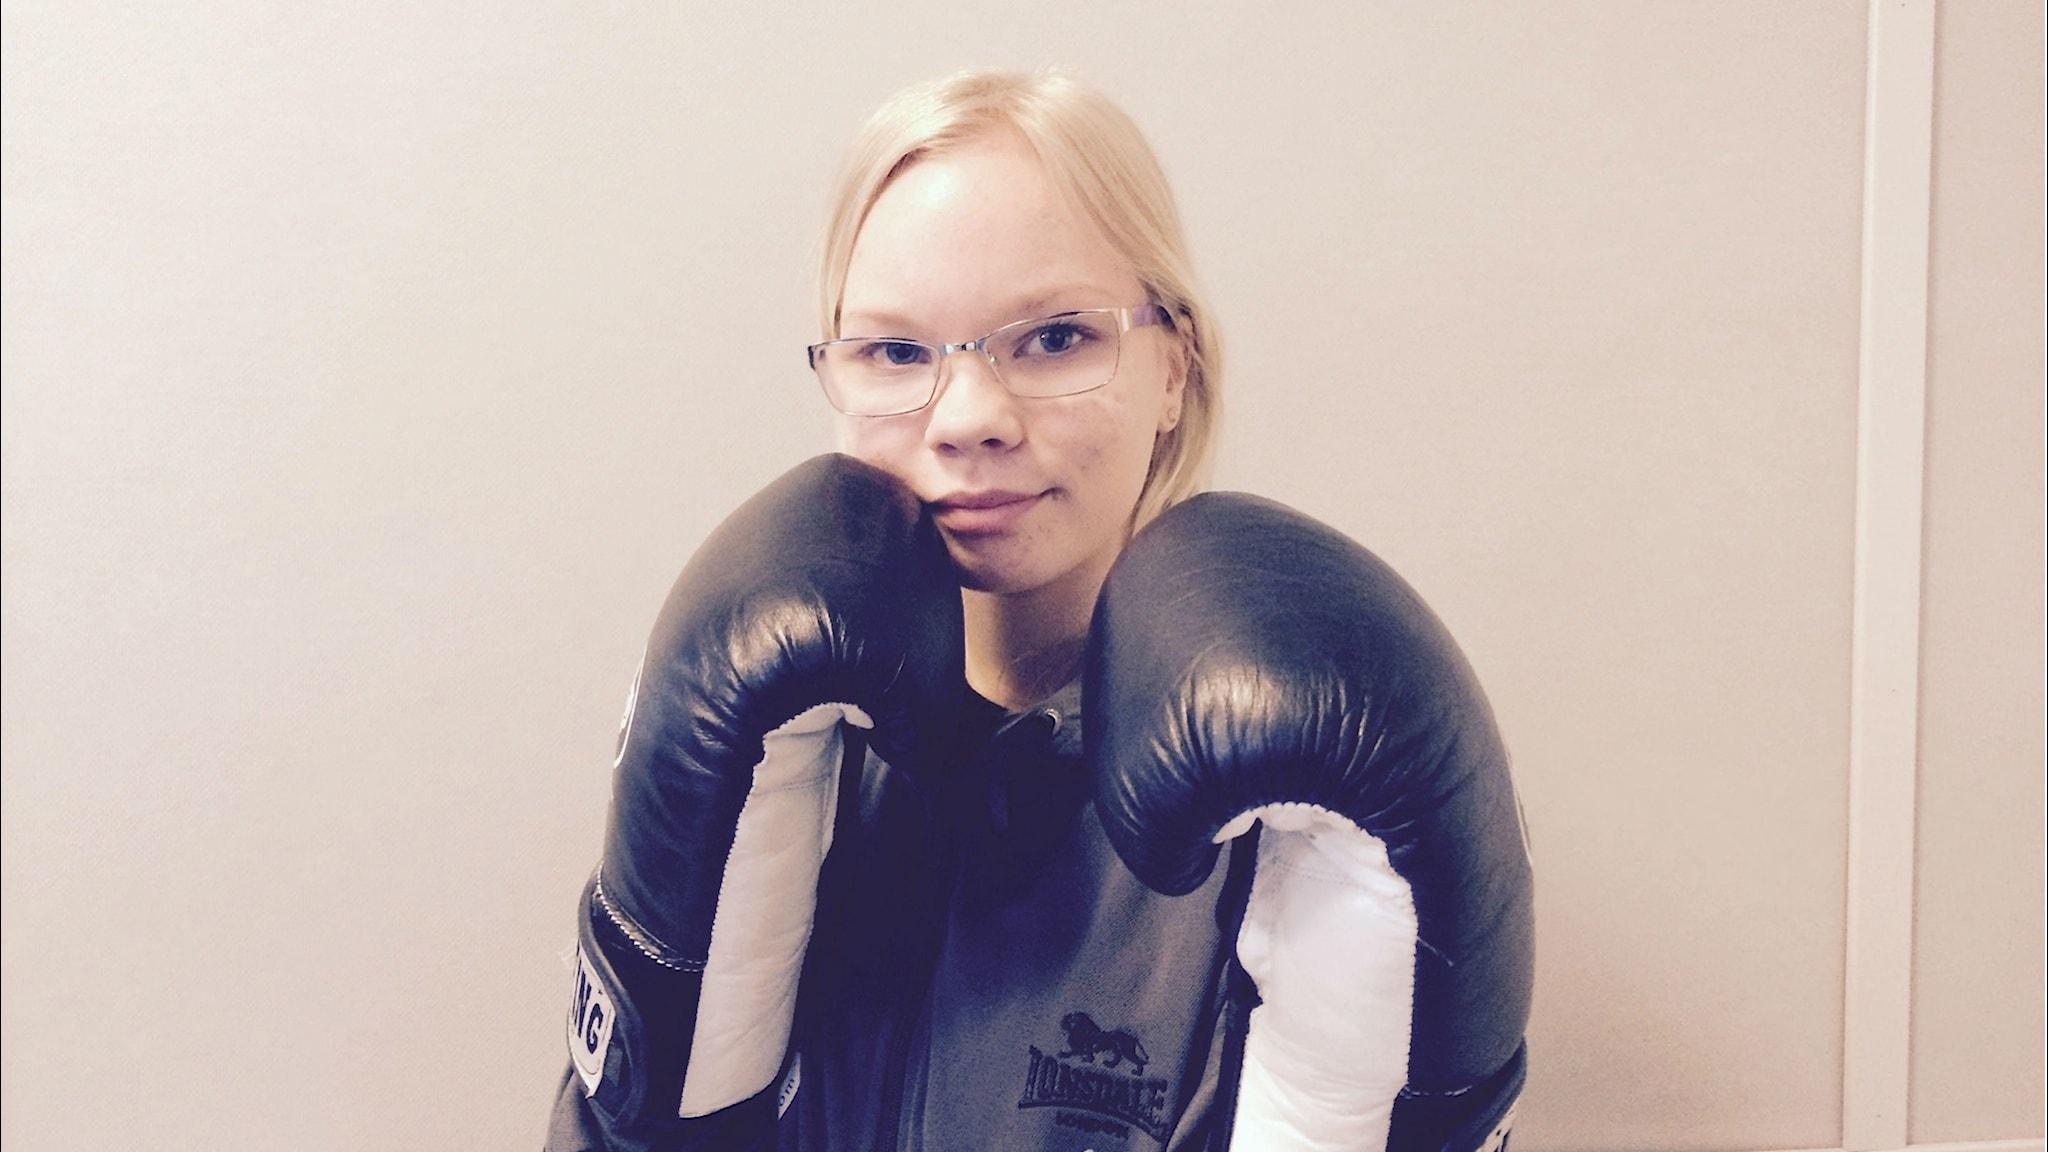 Emma Rainansalo lyö lujaa. Kuva/Foto: Jorma Ikäheimo/Sveriges Radio Sisuradio.